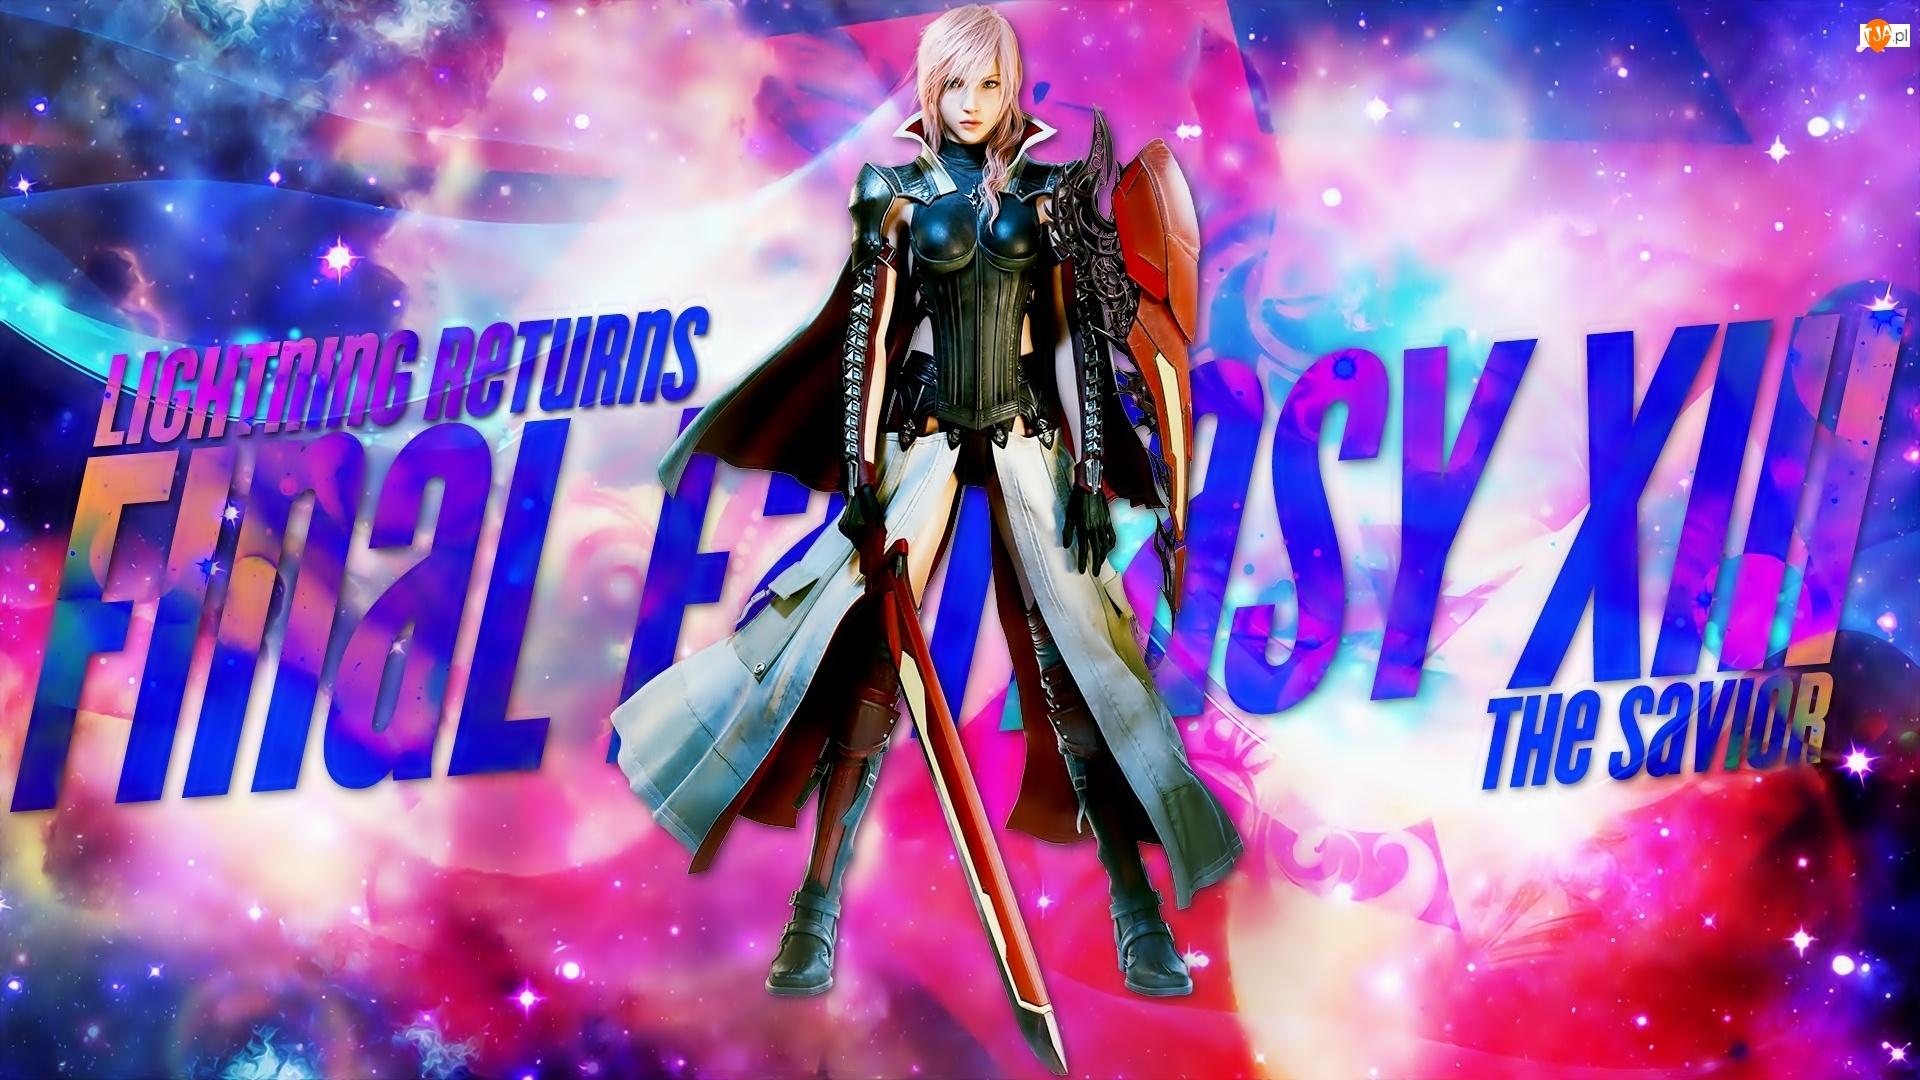 Final Fantasy XIII, Gra